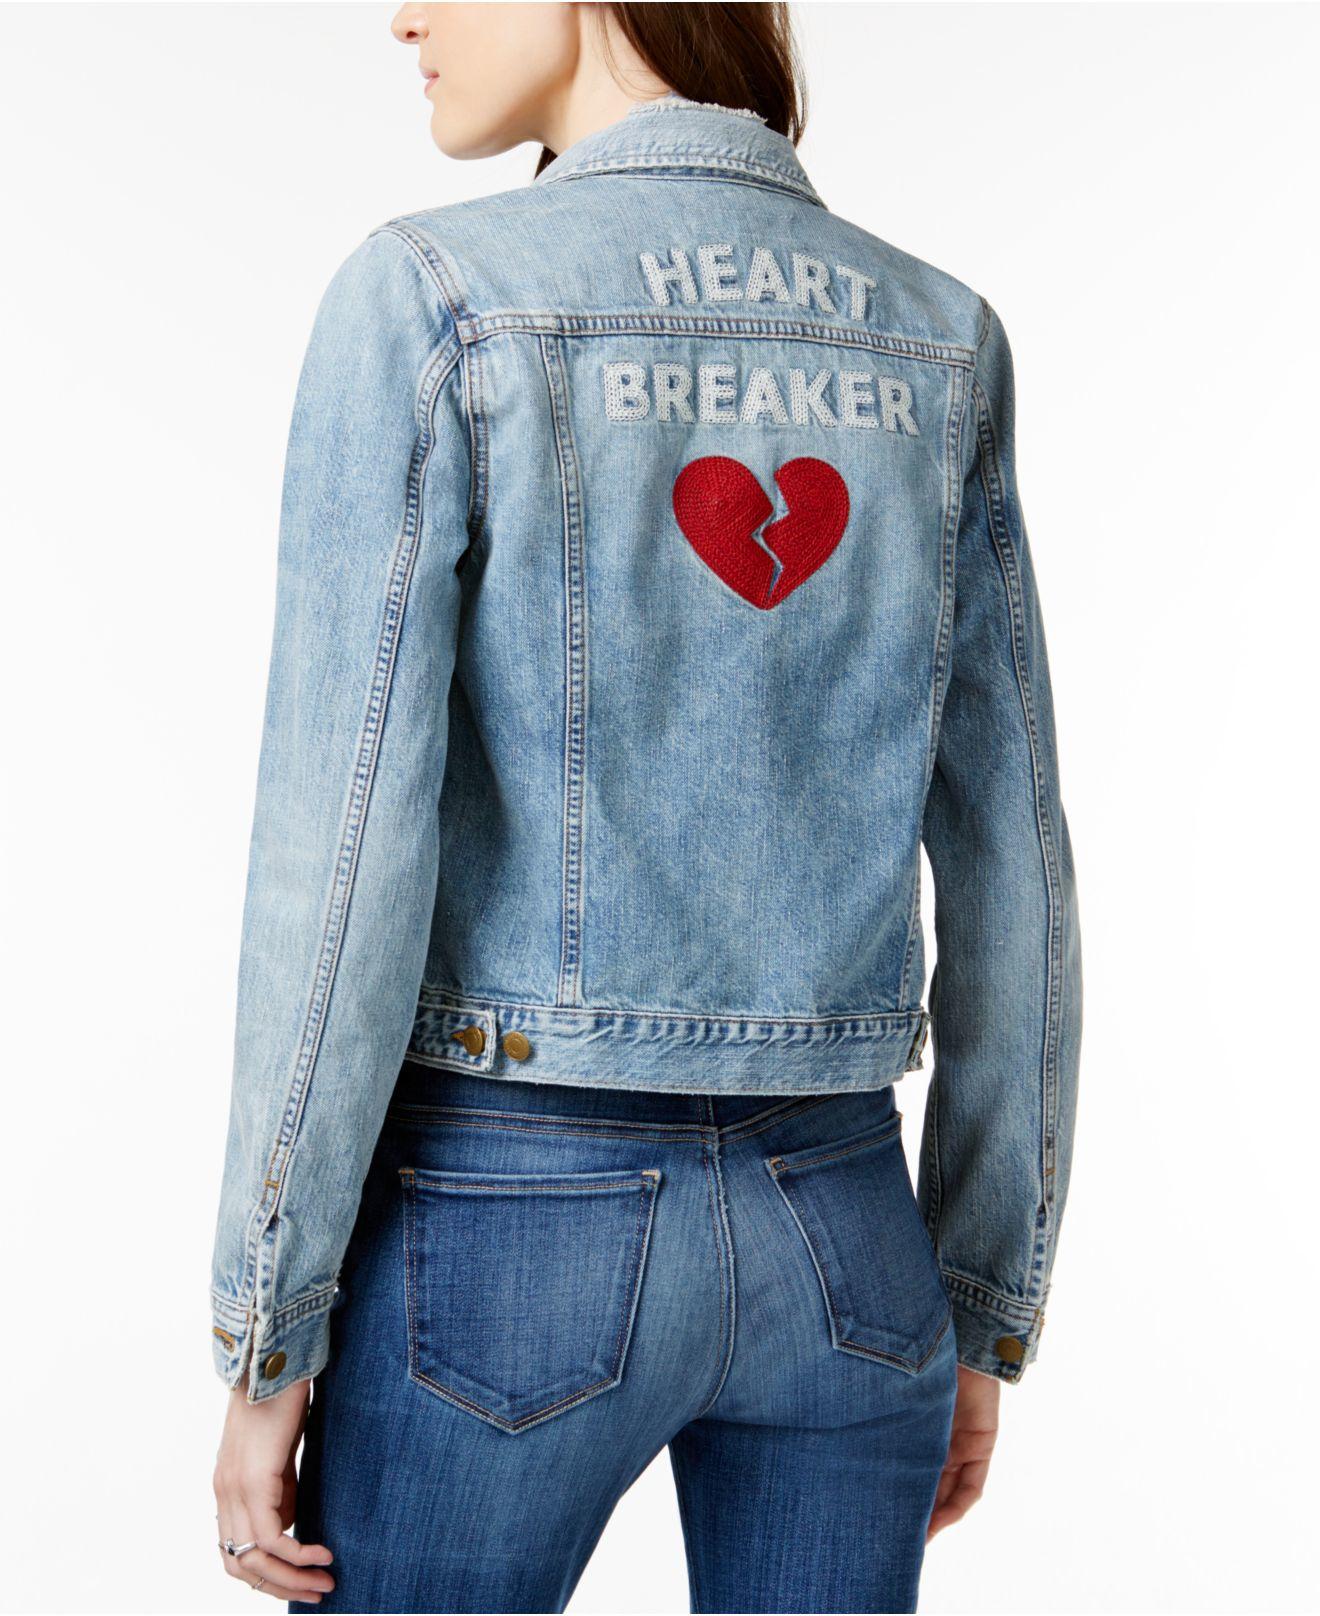 Lyst Lucky Brand Heart Breaker Graphic Lima Wash Denim